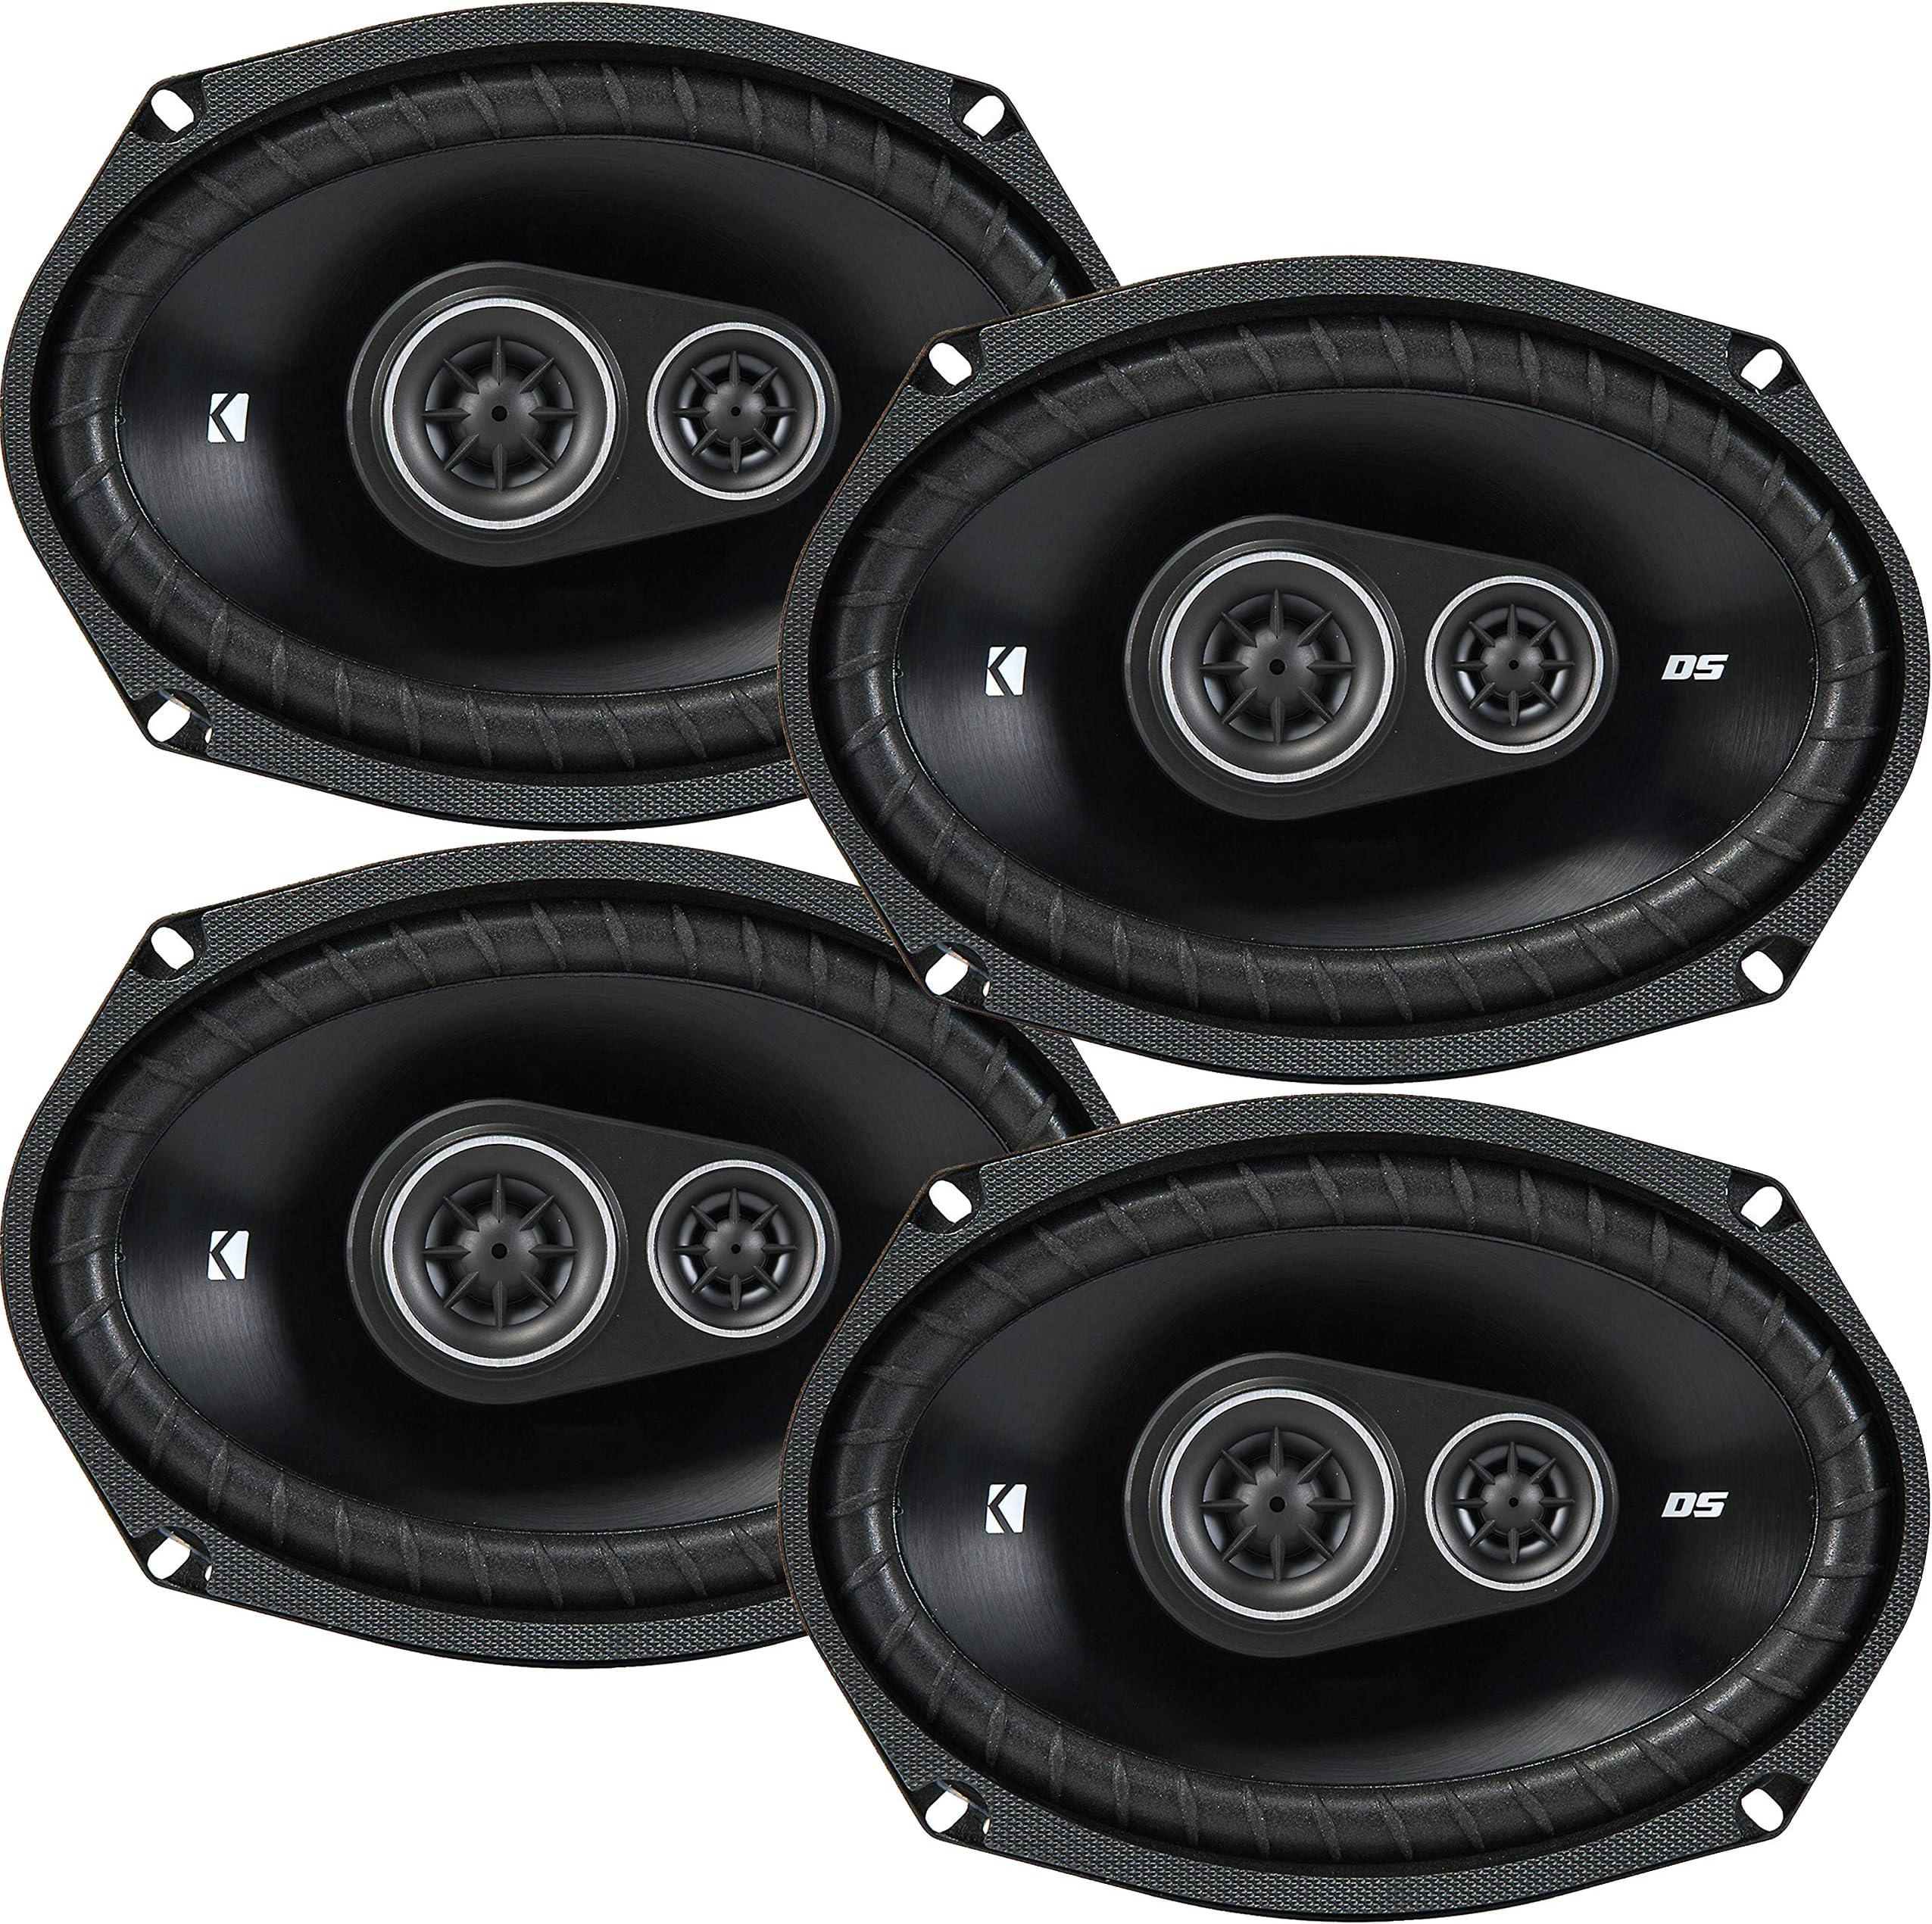 4 New Kicker DSC69 D-Series 6x9 720 Watt 3-Way Car Audio Coaxial Speakers - Grills Included